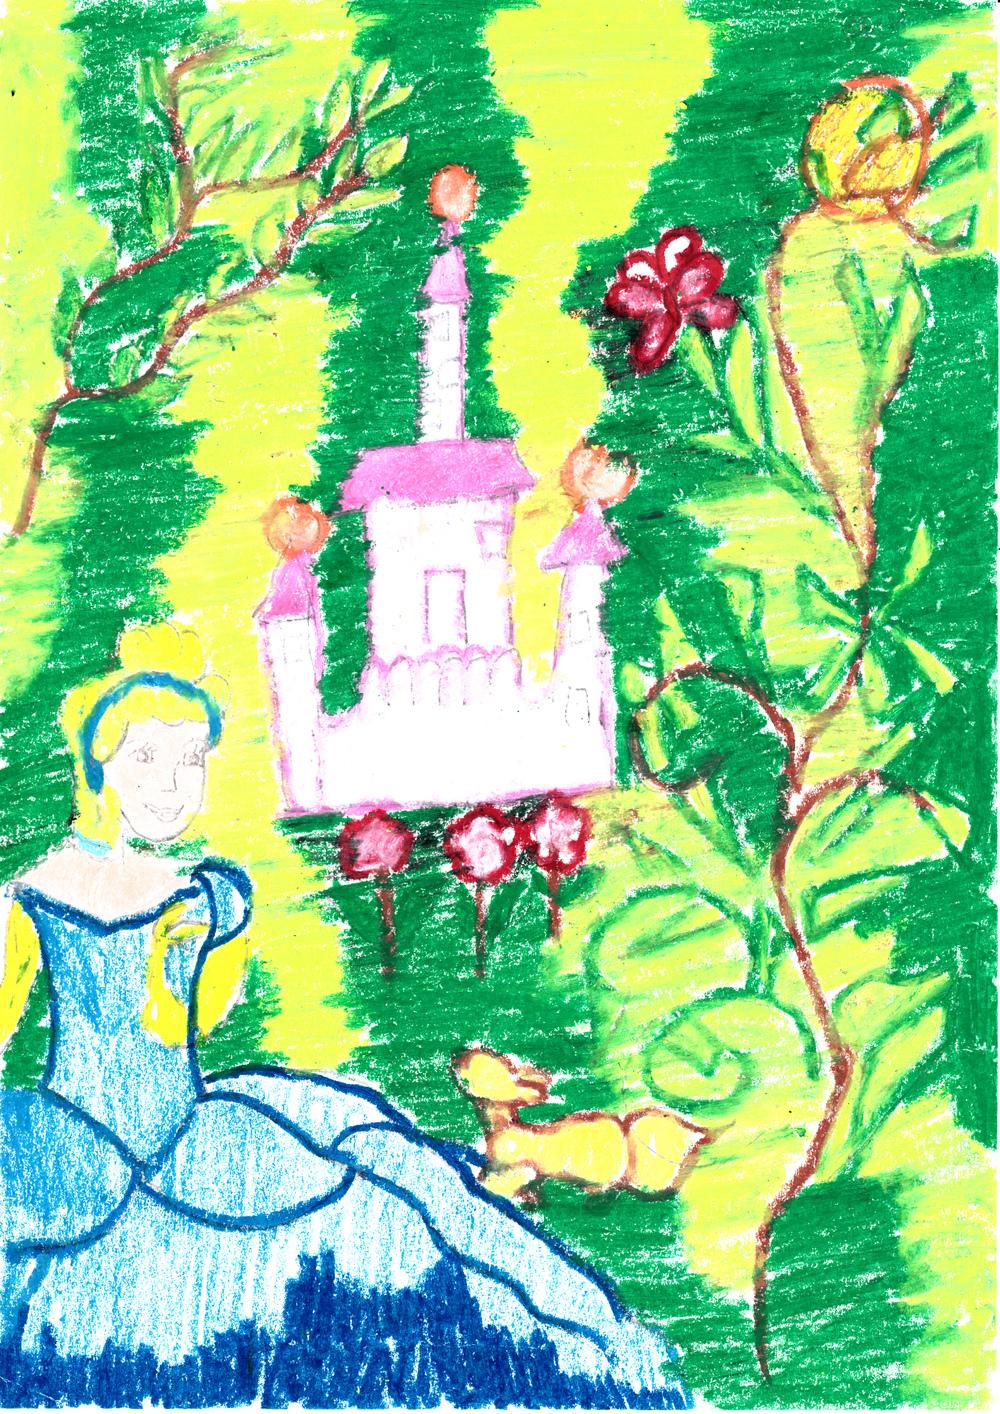 Students art work from Bolawalana Orphanage 3_0035.jpg